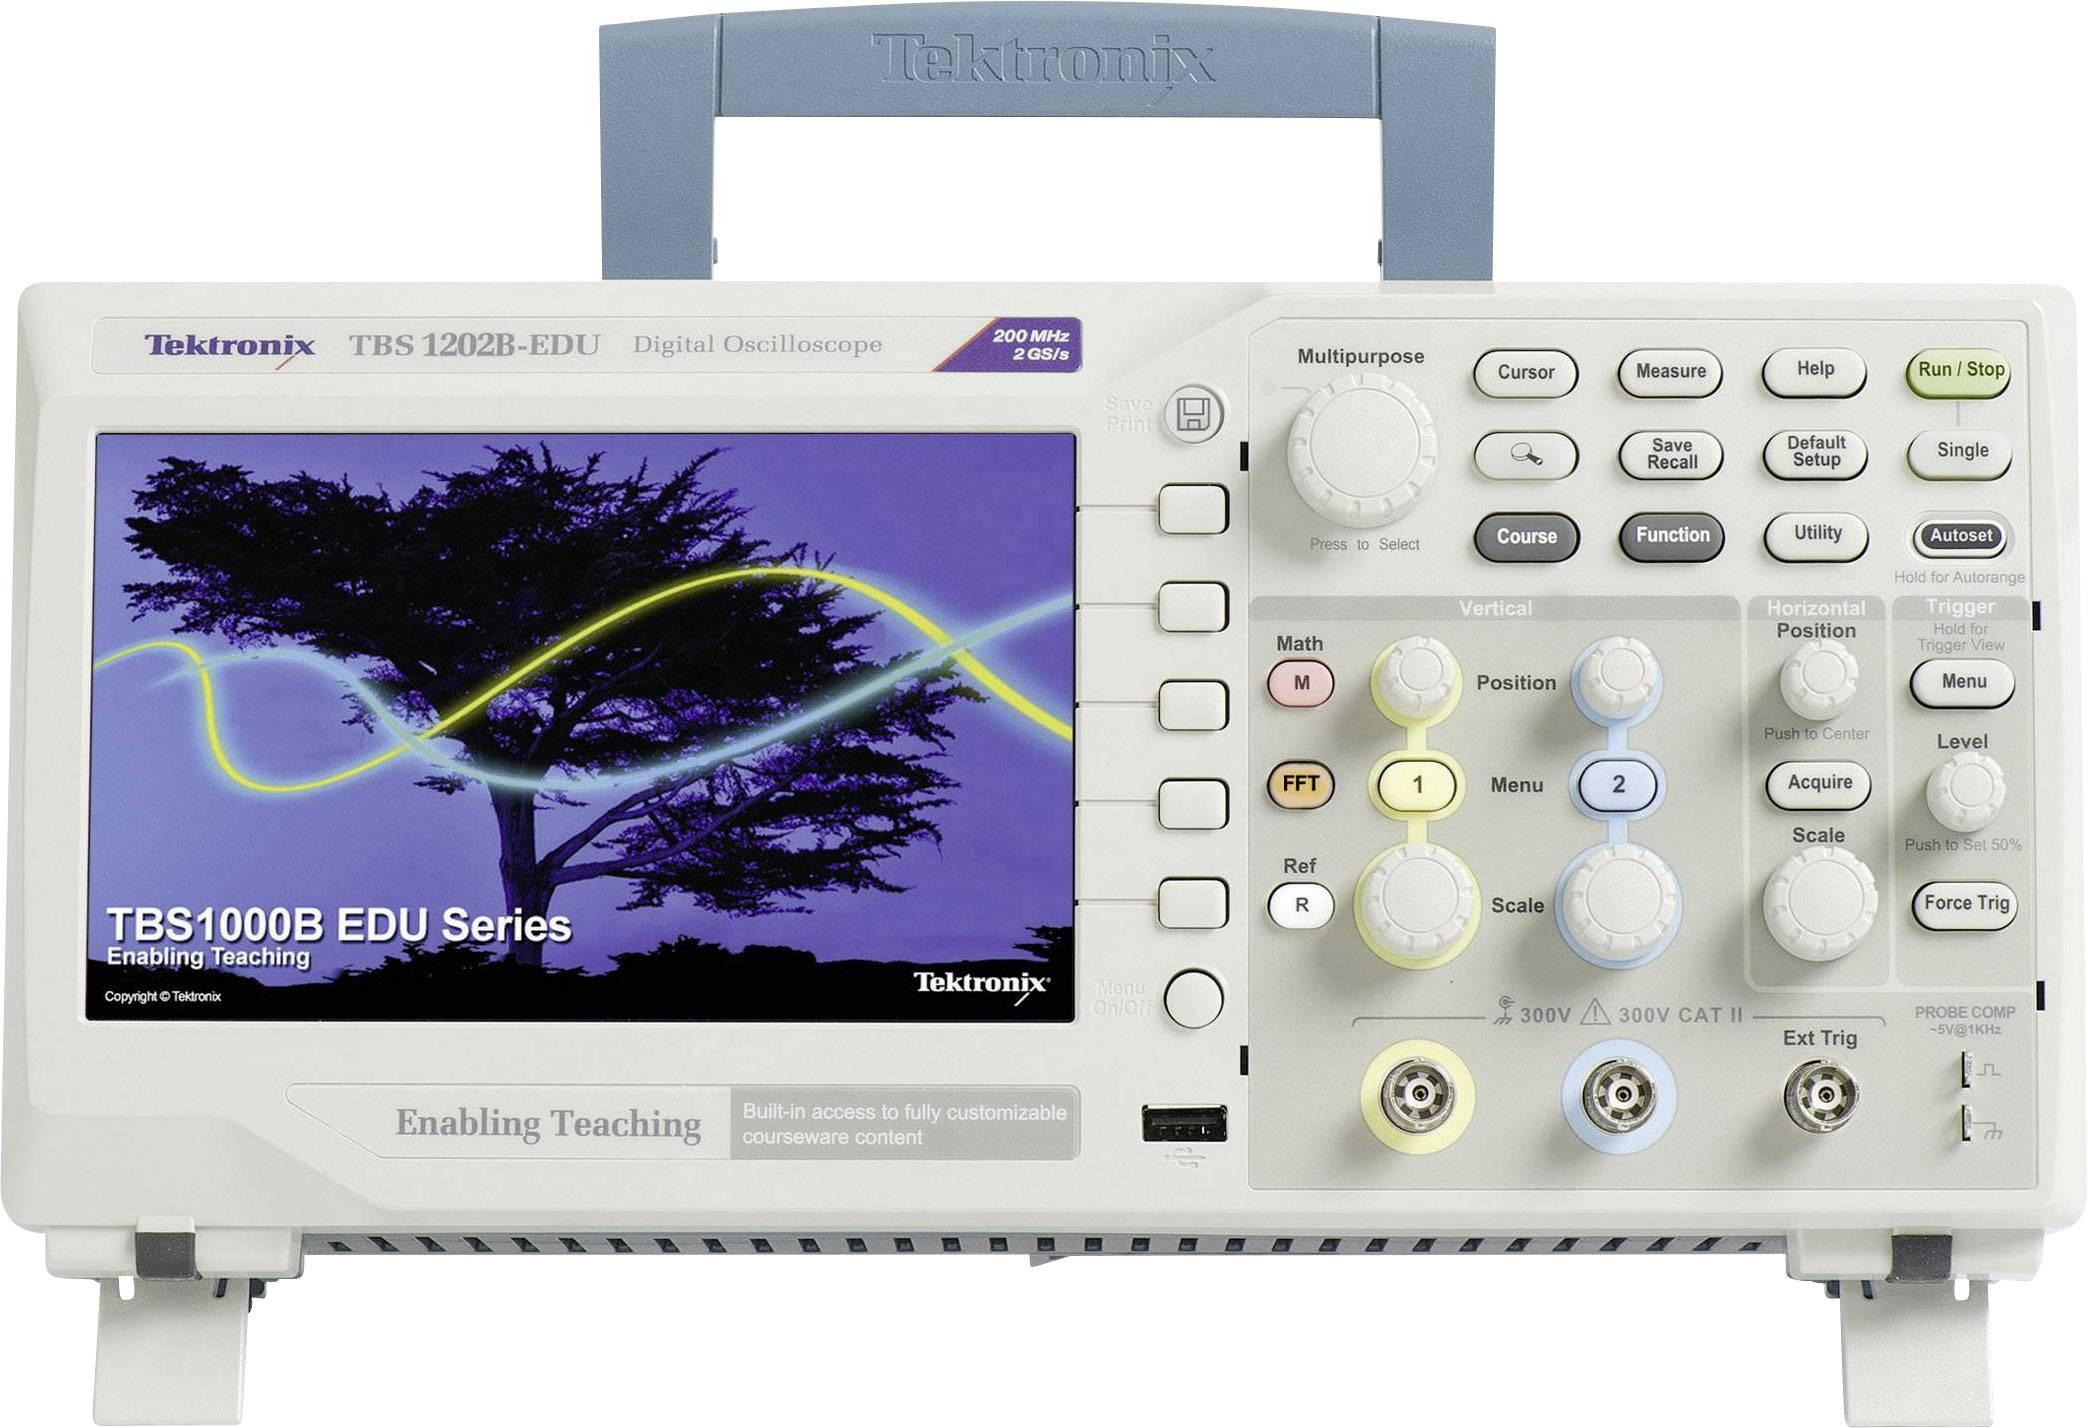 Digitálny osciloskop Tektronix TBS1202B-EDU, 200 MHz, 2-kanálový, kalibrácia podľa ISO